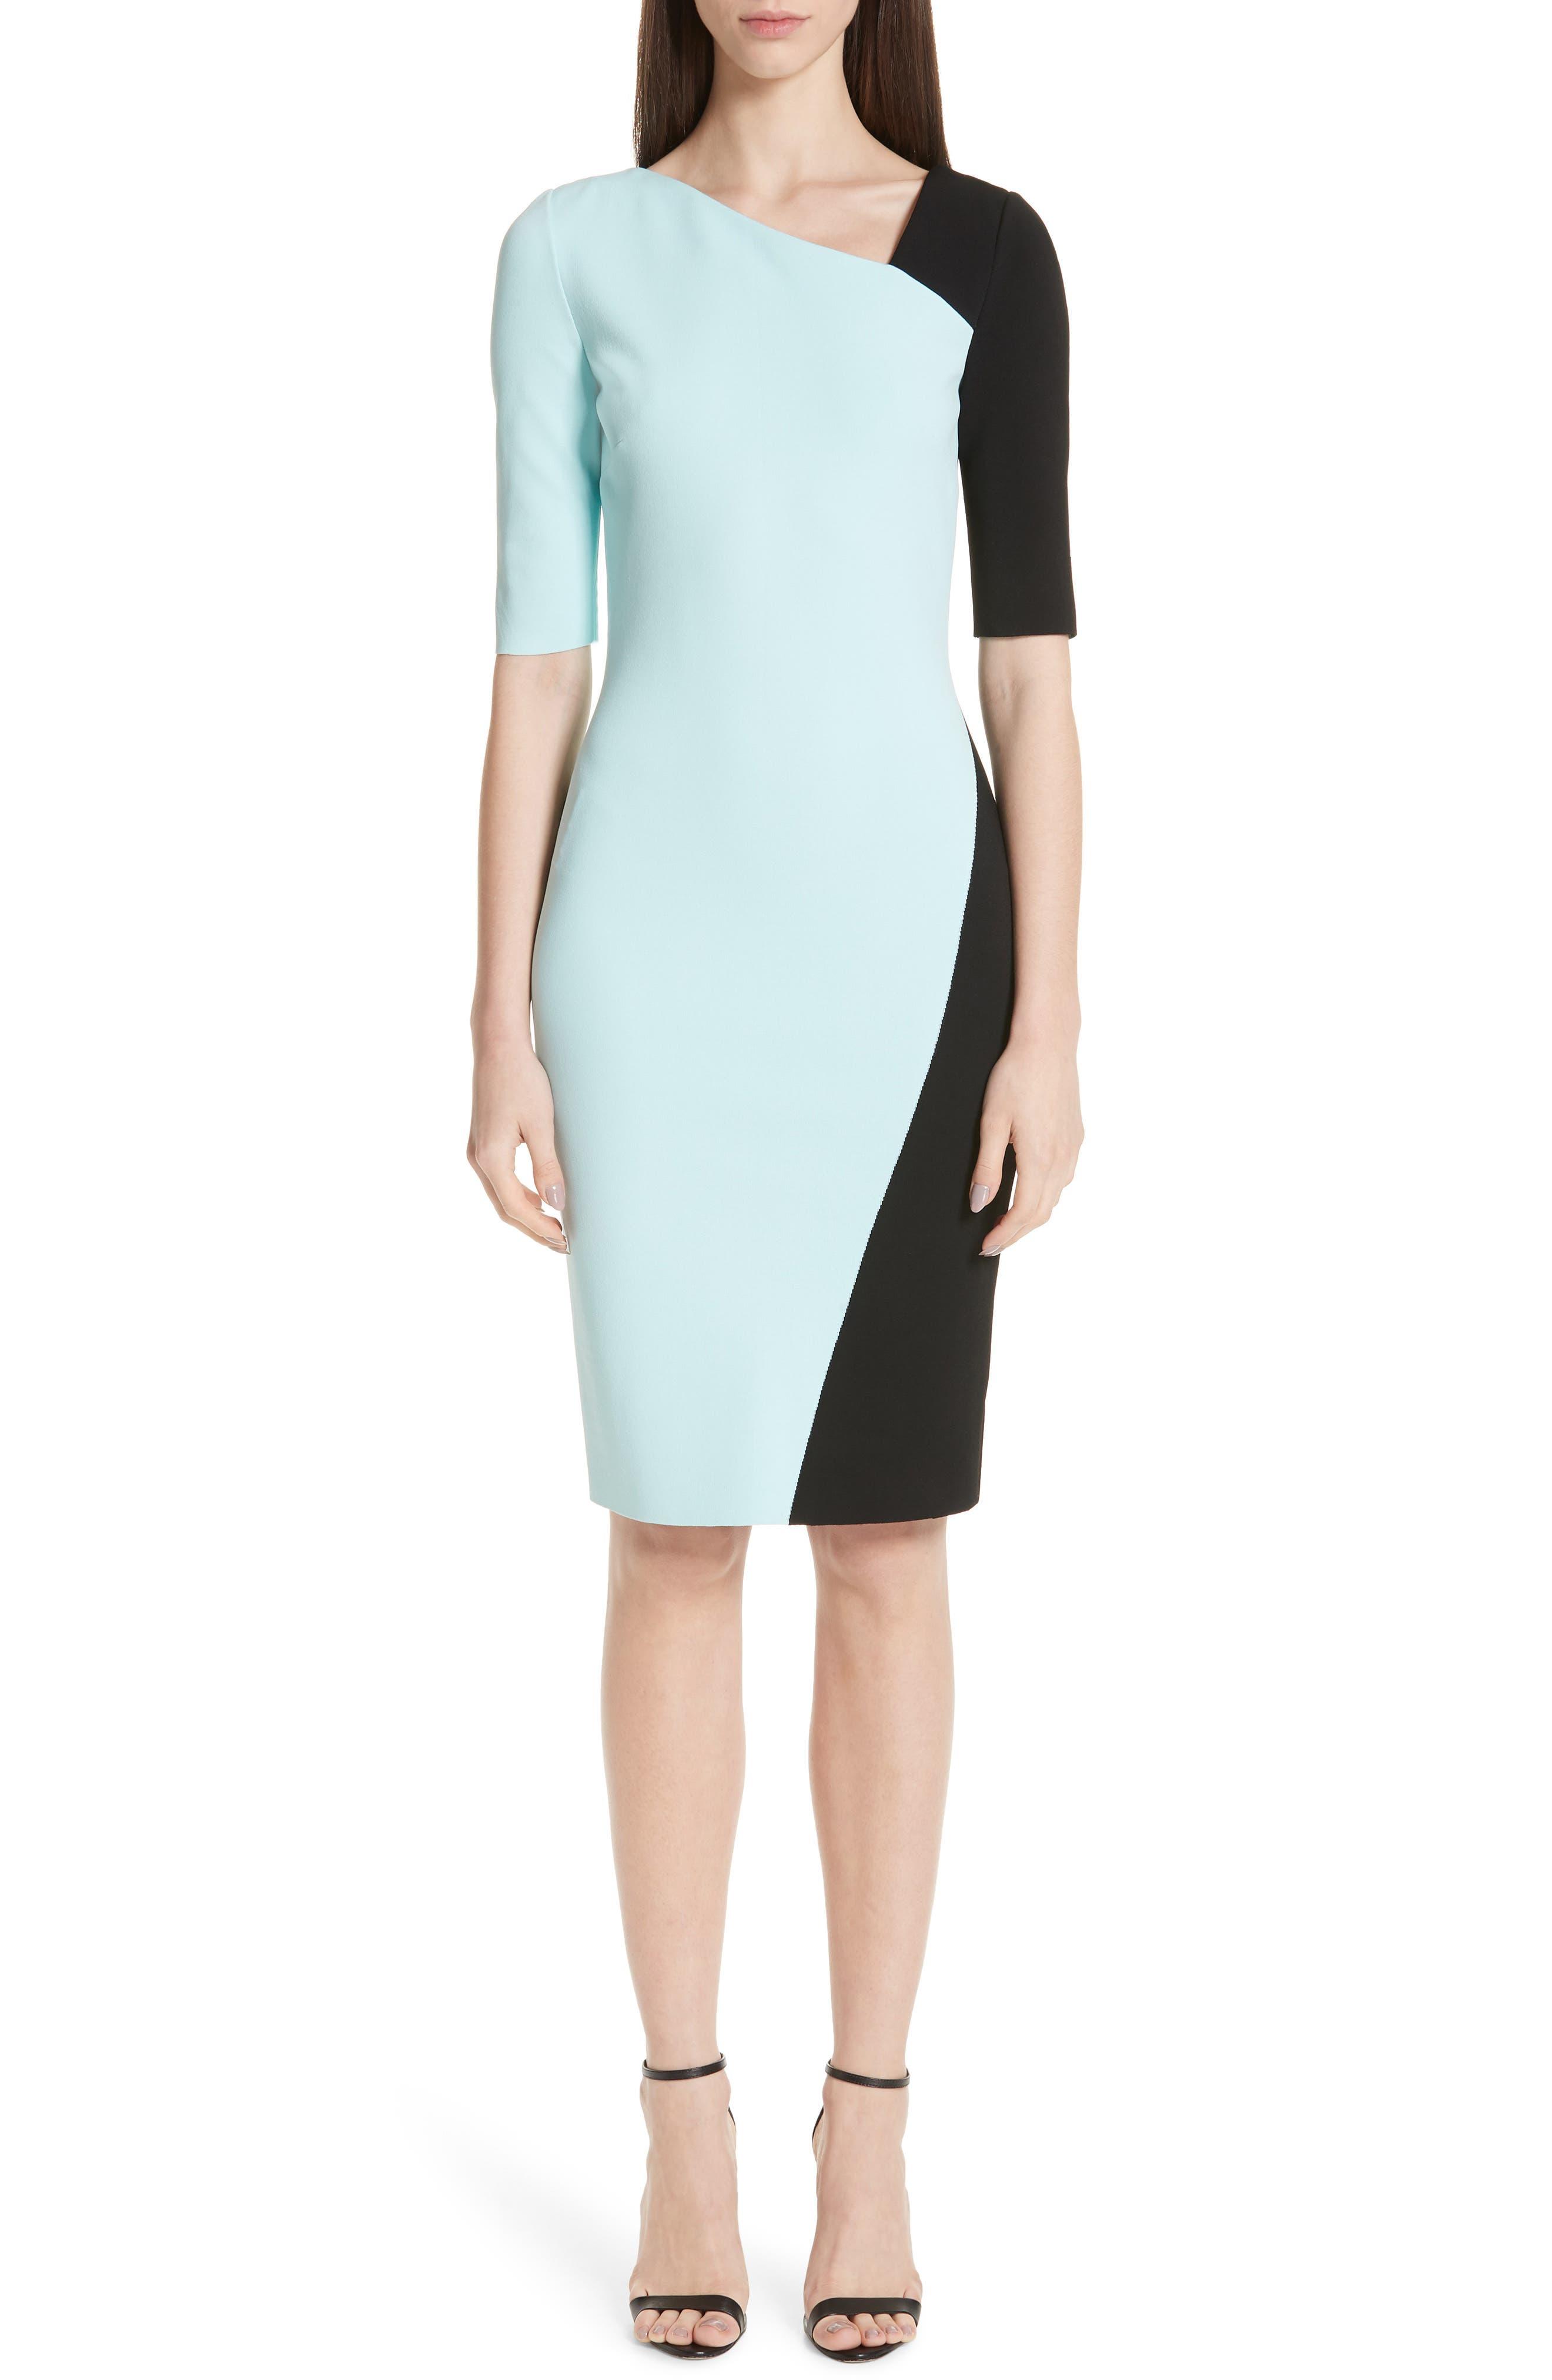 ST. JOHN COLLECTION, Luxe Sculpture Knit Dress, Main thumbnail 1, color, SEAFOAM/ CAVIAR